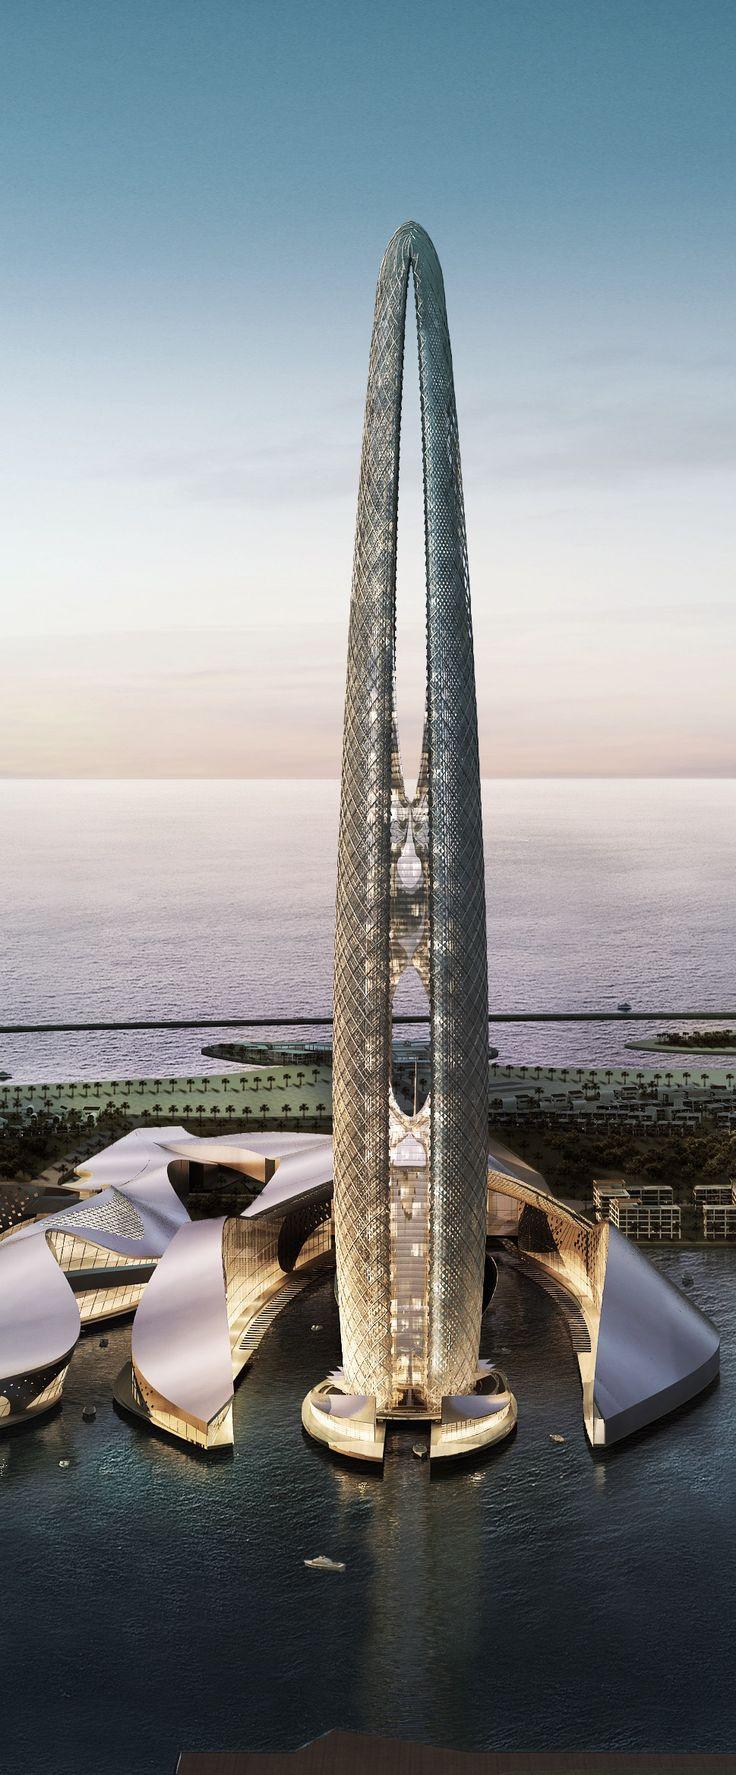 Lulu Island Tower, Abu Dhabi, UAE designed by Skidmore, Owings & Merrill (SOM) Architects :: 75 floors, height 400m :: vision